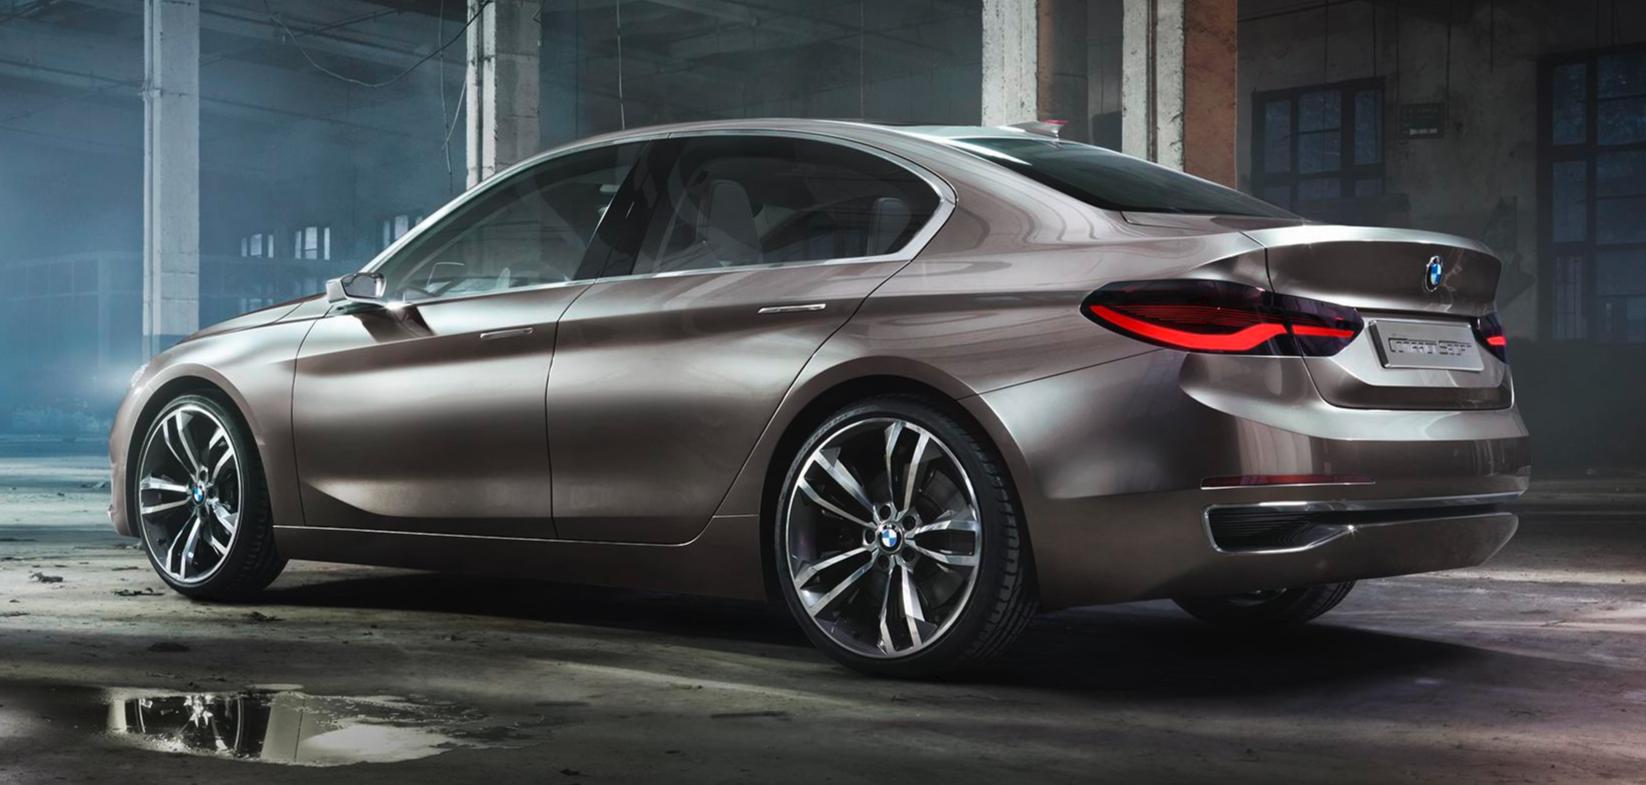 BMW Compact Sedan Concept - blog Kidioui.fr